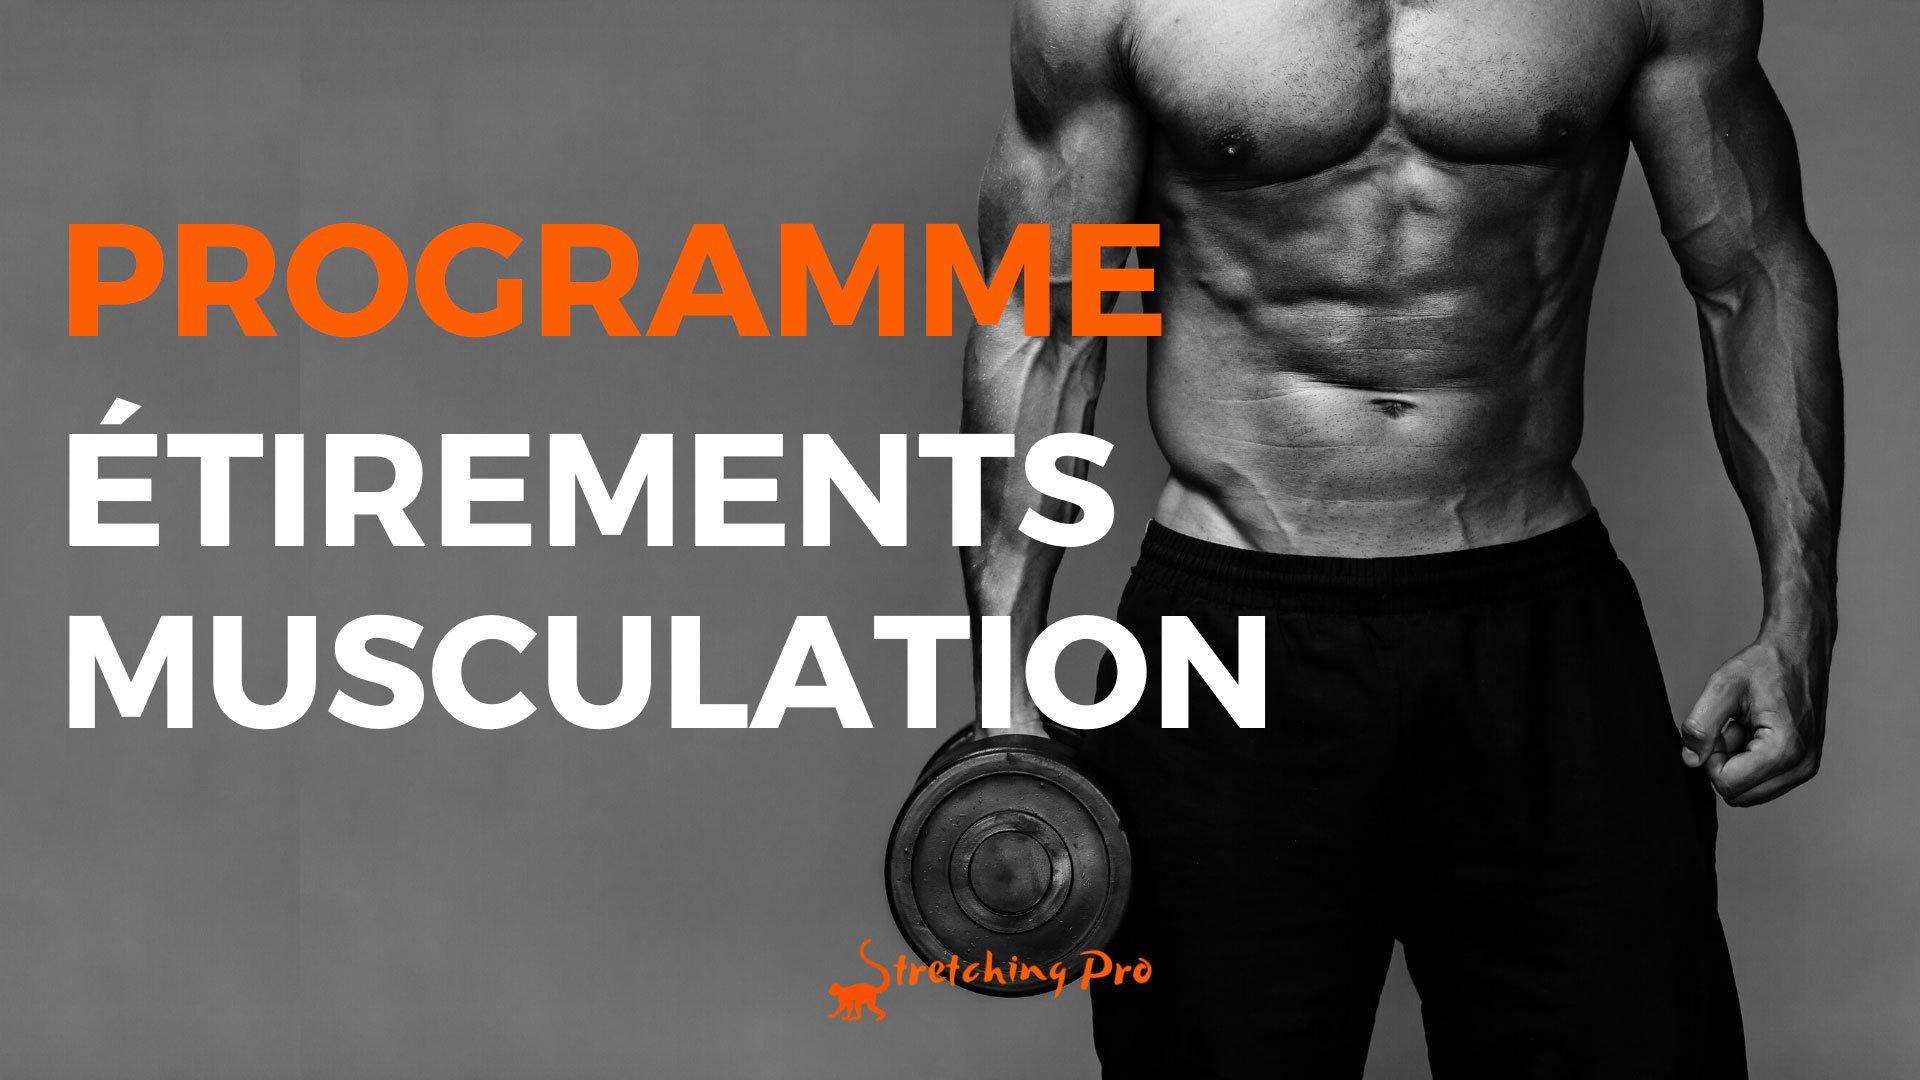 stretchingpro-programme-etirements-musculation